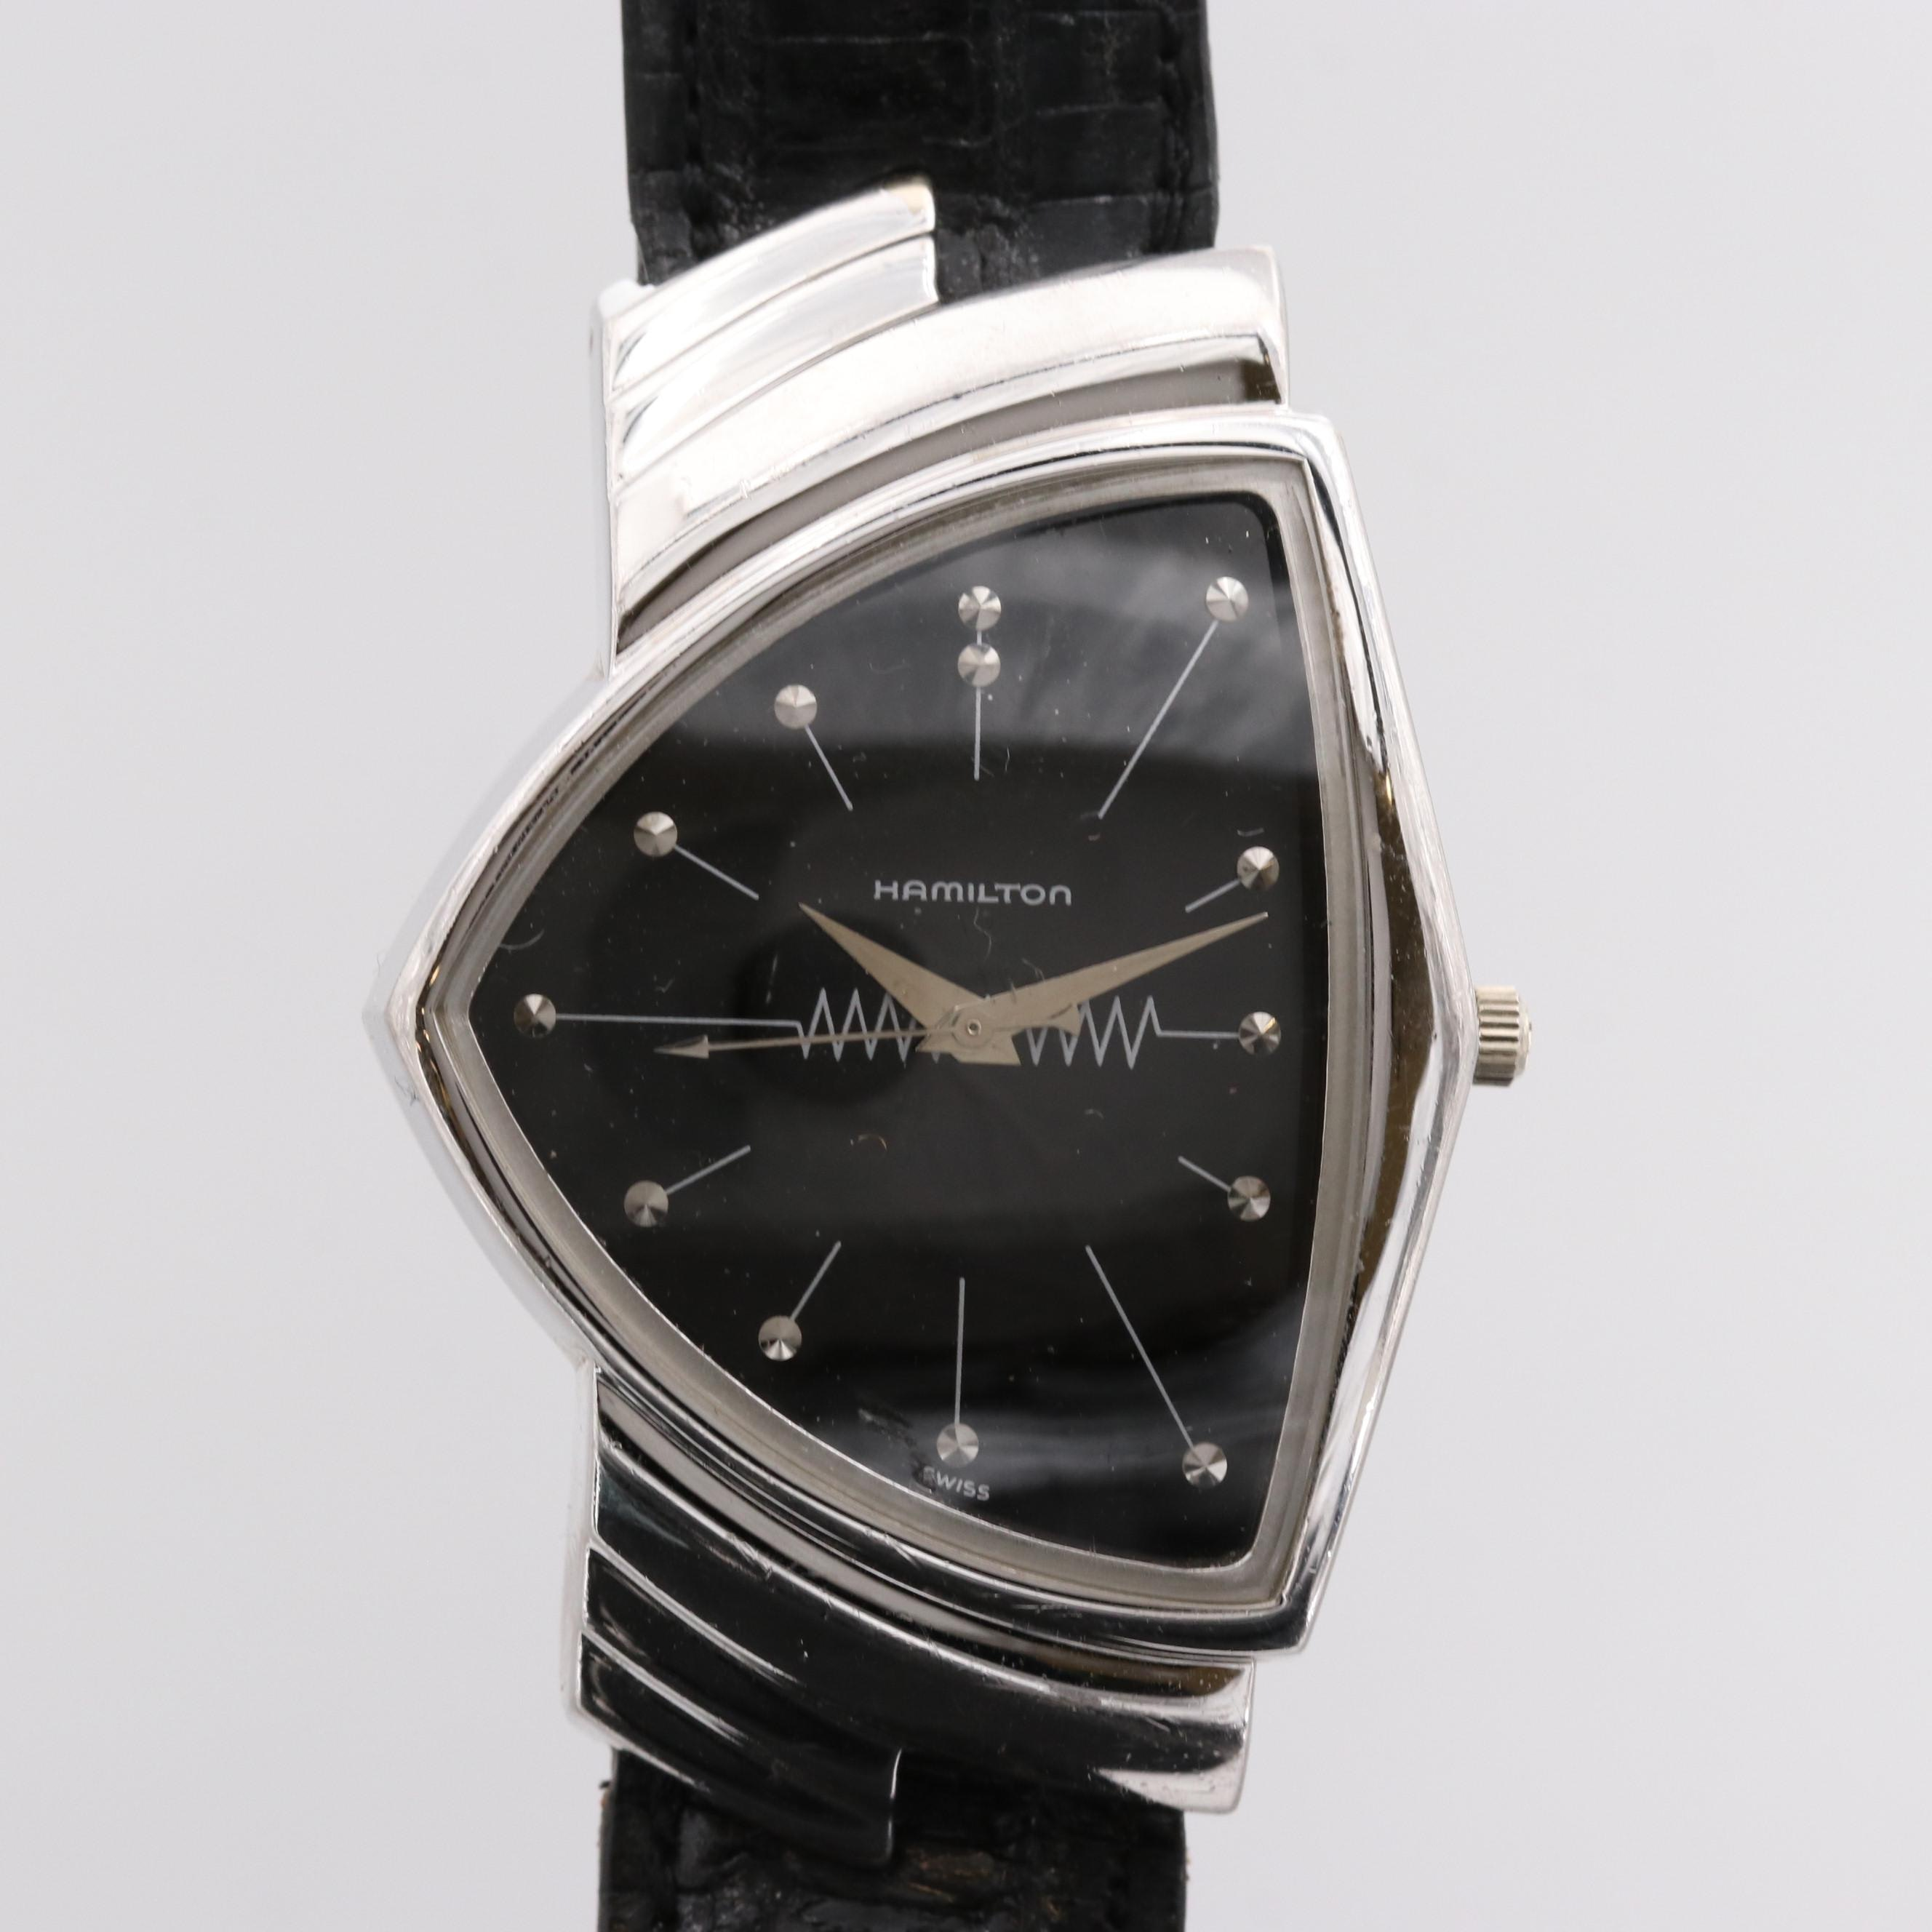 Hamilton Ventura Registered Edition 18K White Gold Plated Wristwatch